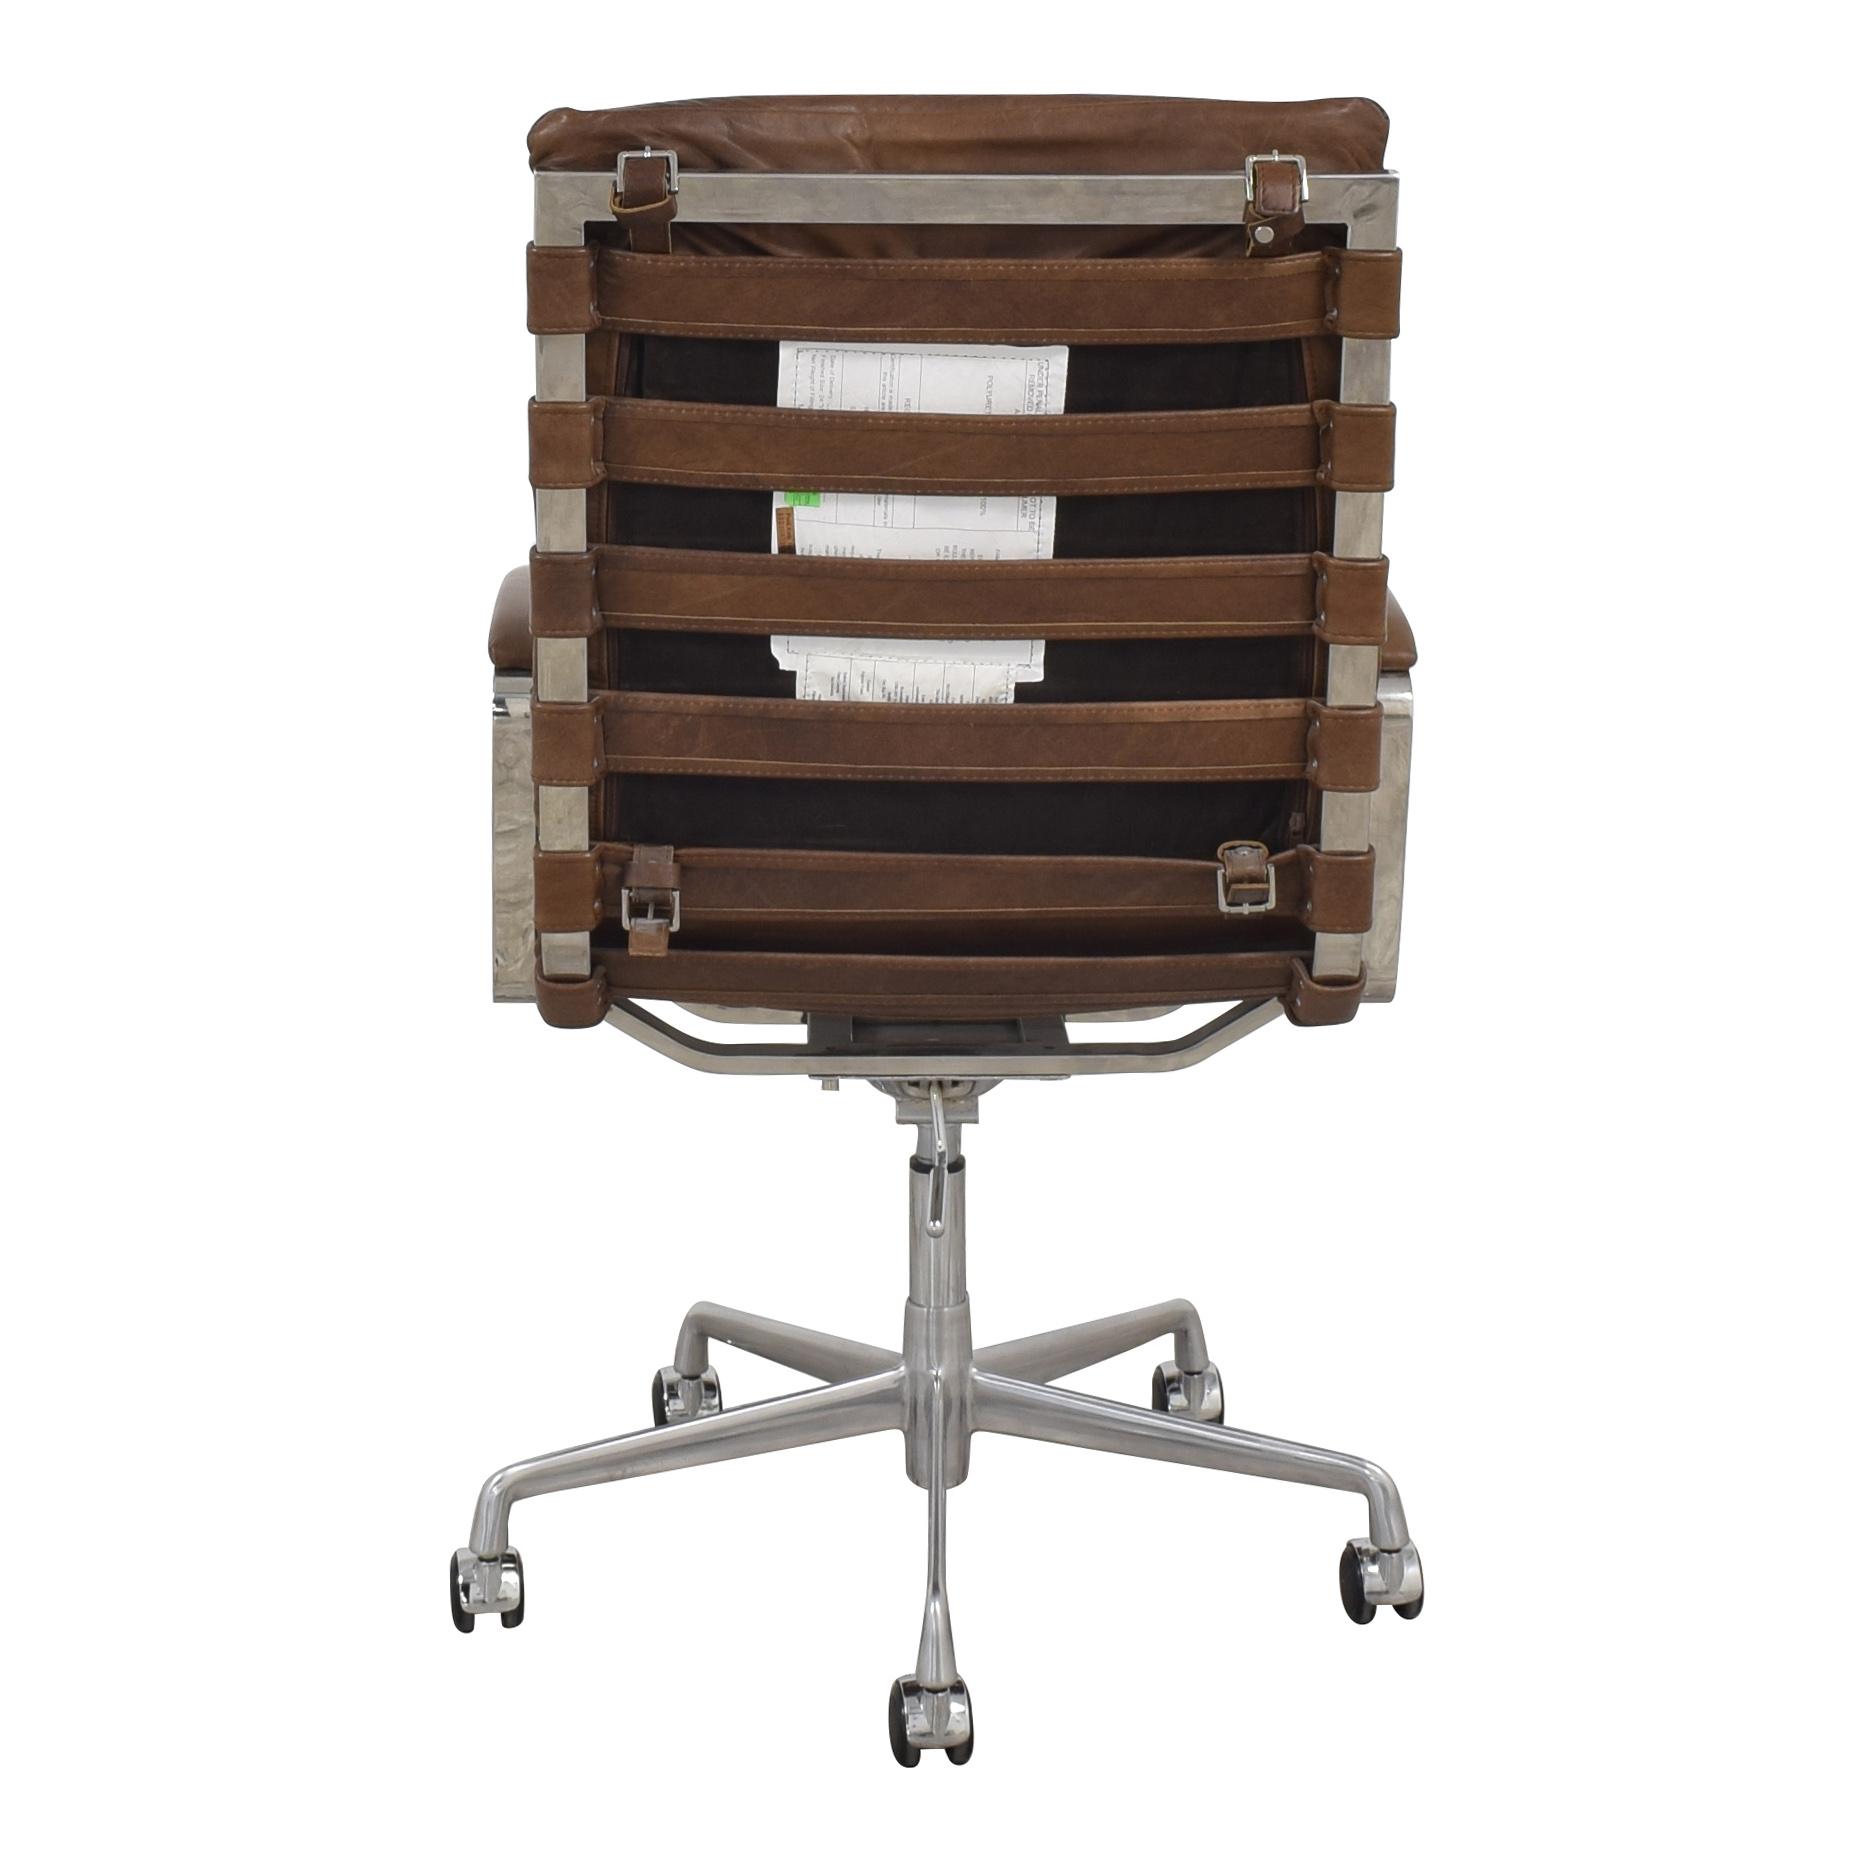 Restoration Hardware Restoration Hardware Oviedo Leather Desk Chair nj